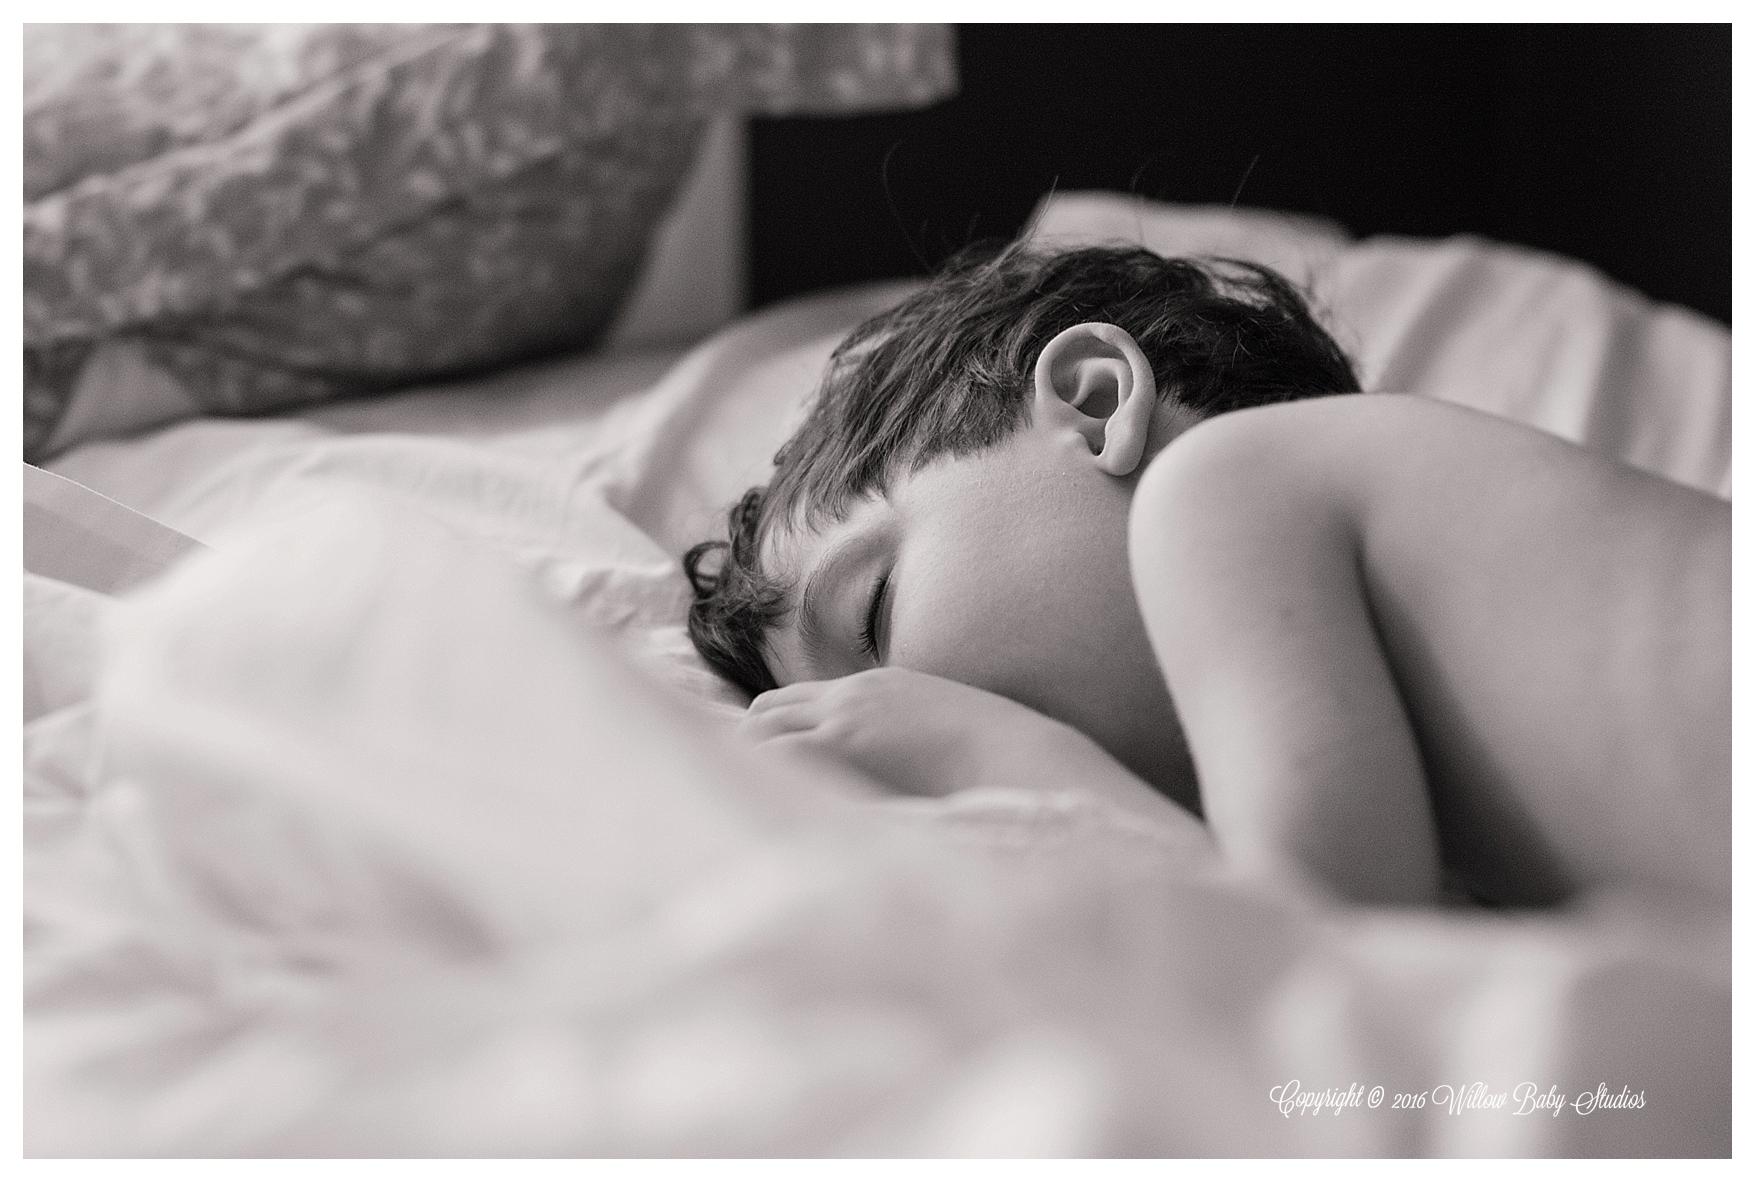 wbs-sleeping-2